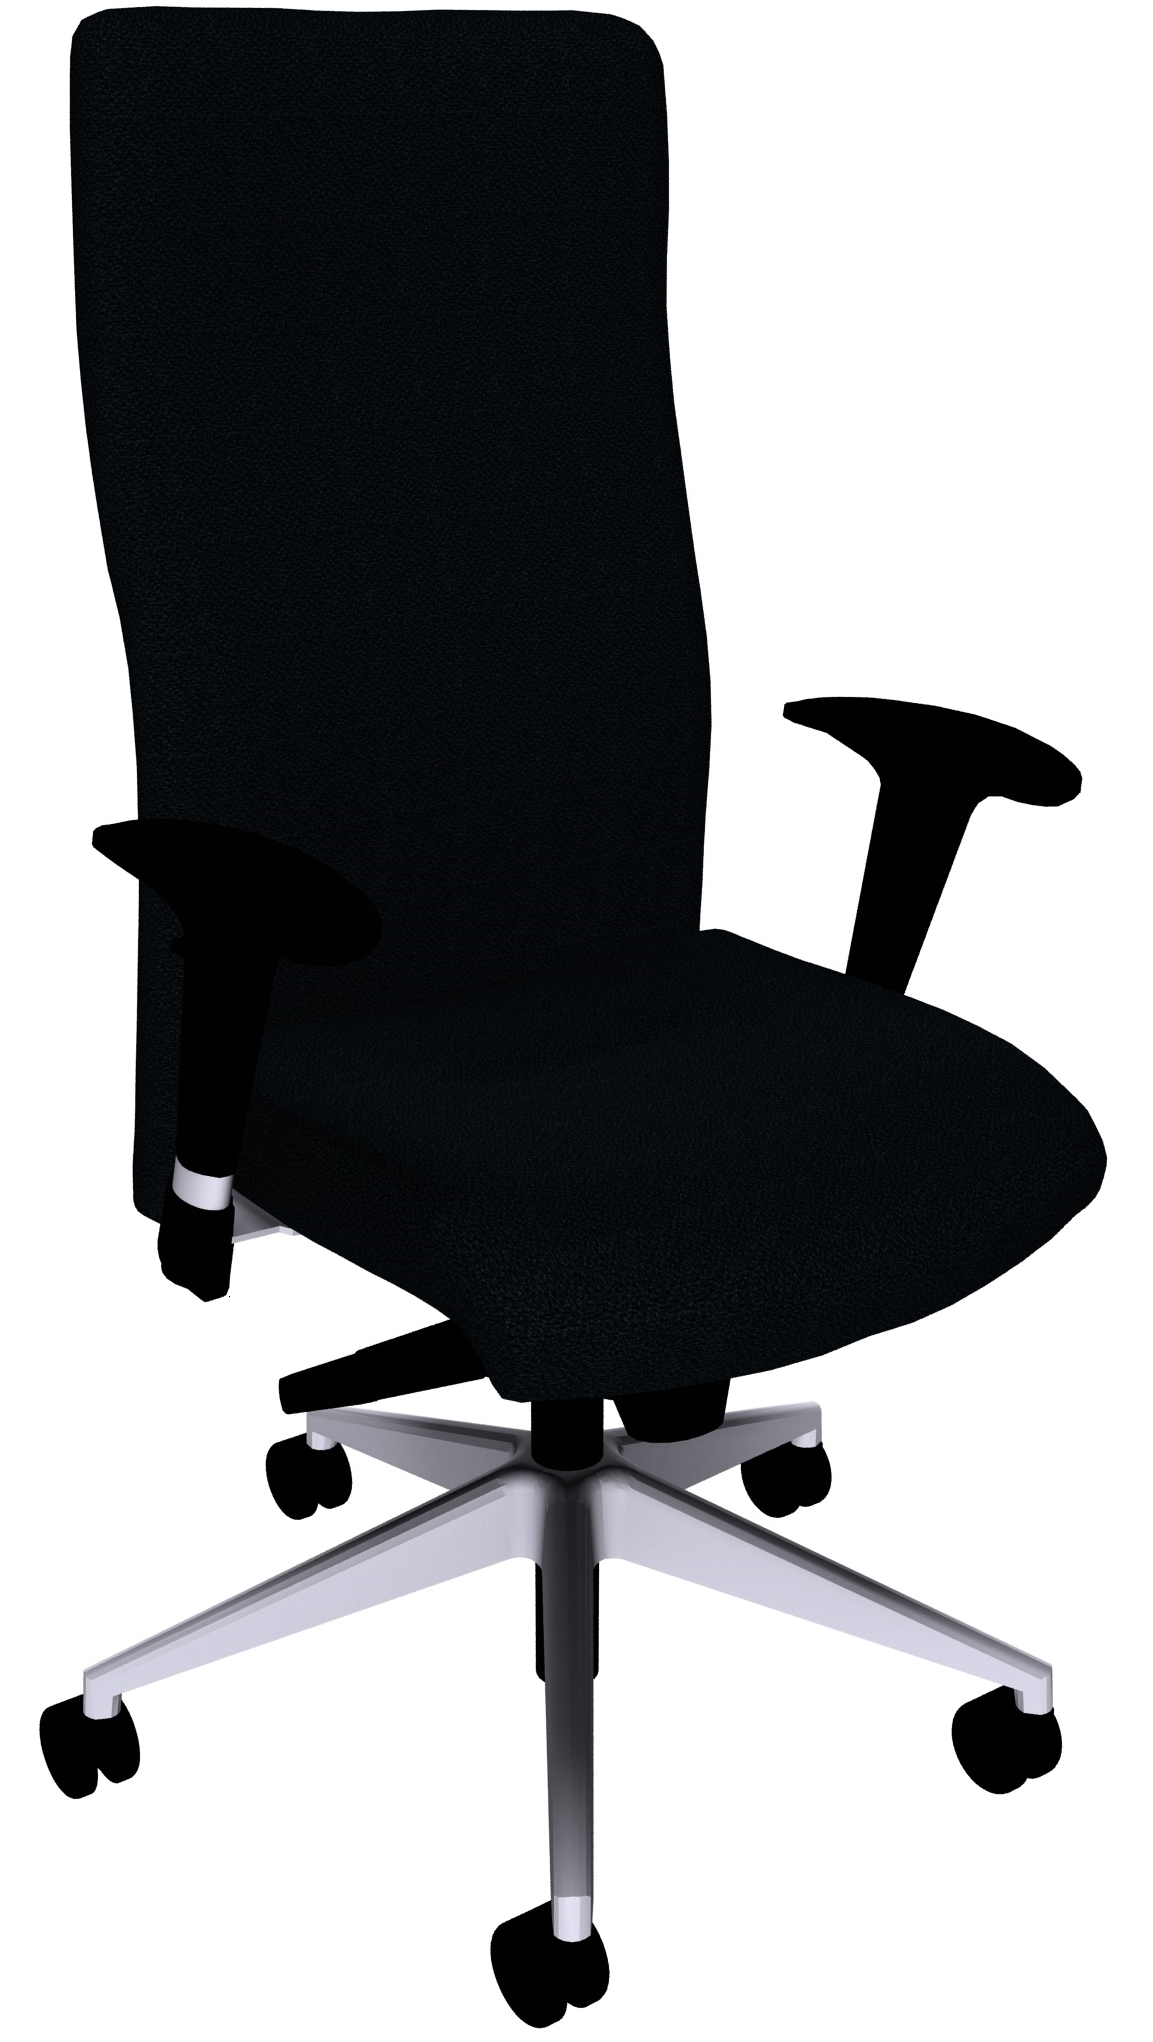 art-office-shop-rovo-chair-4020-S4-buerostuhl-2018